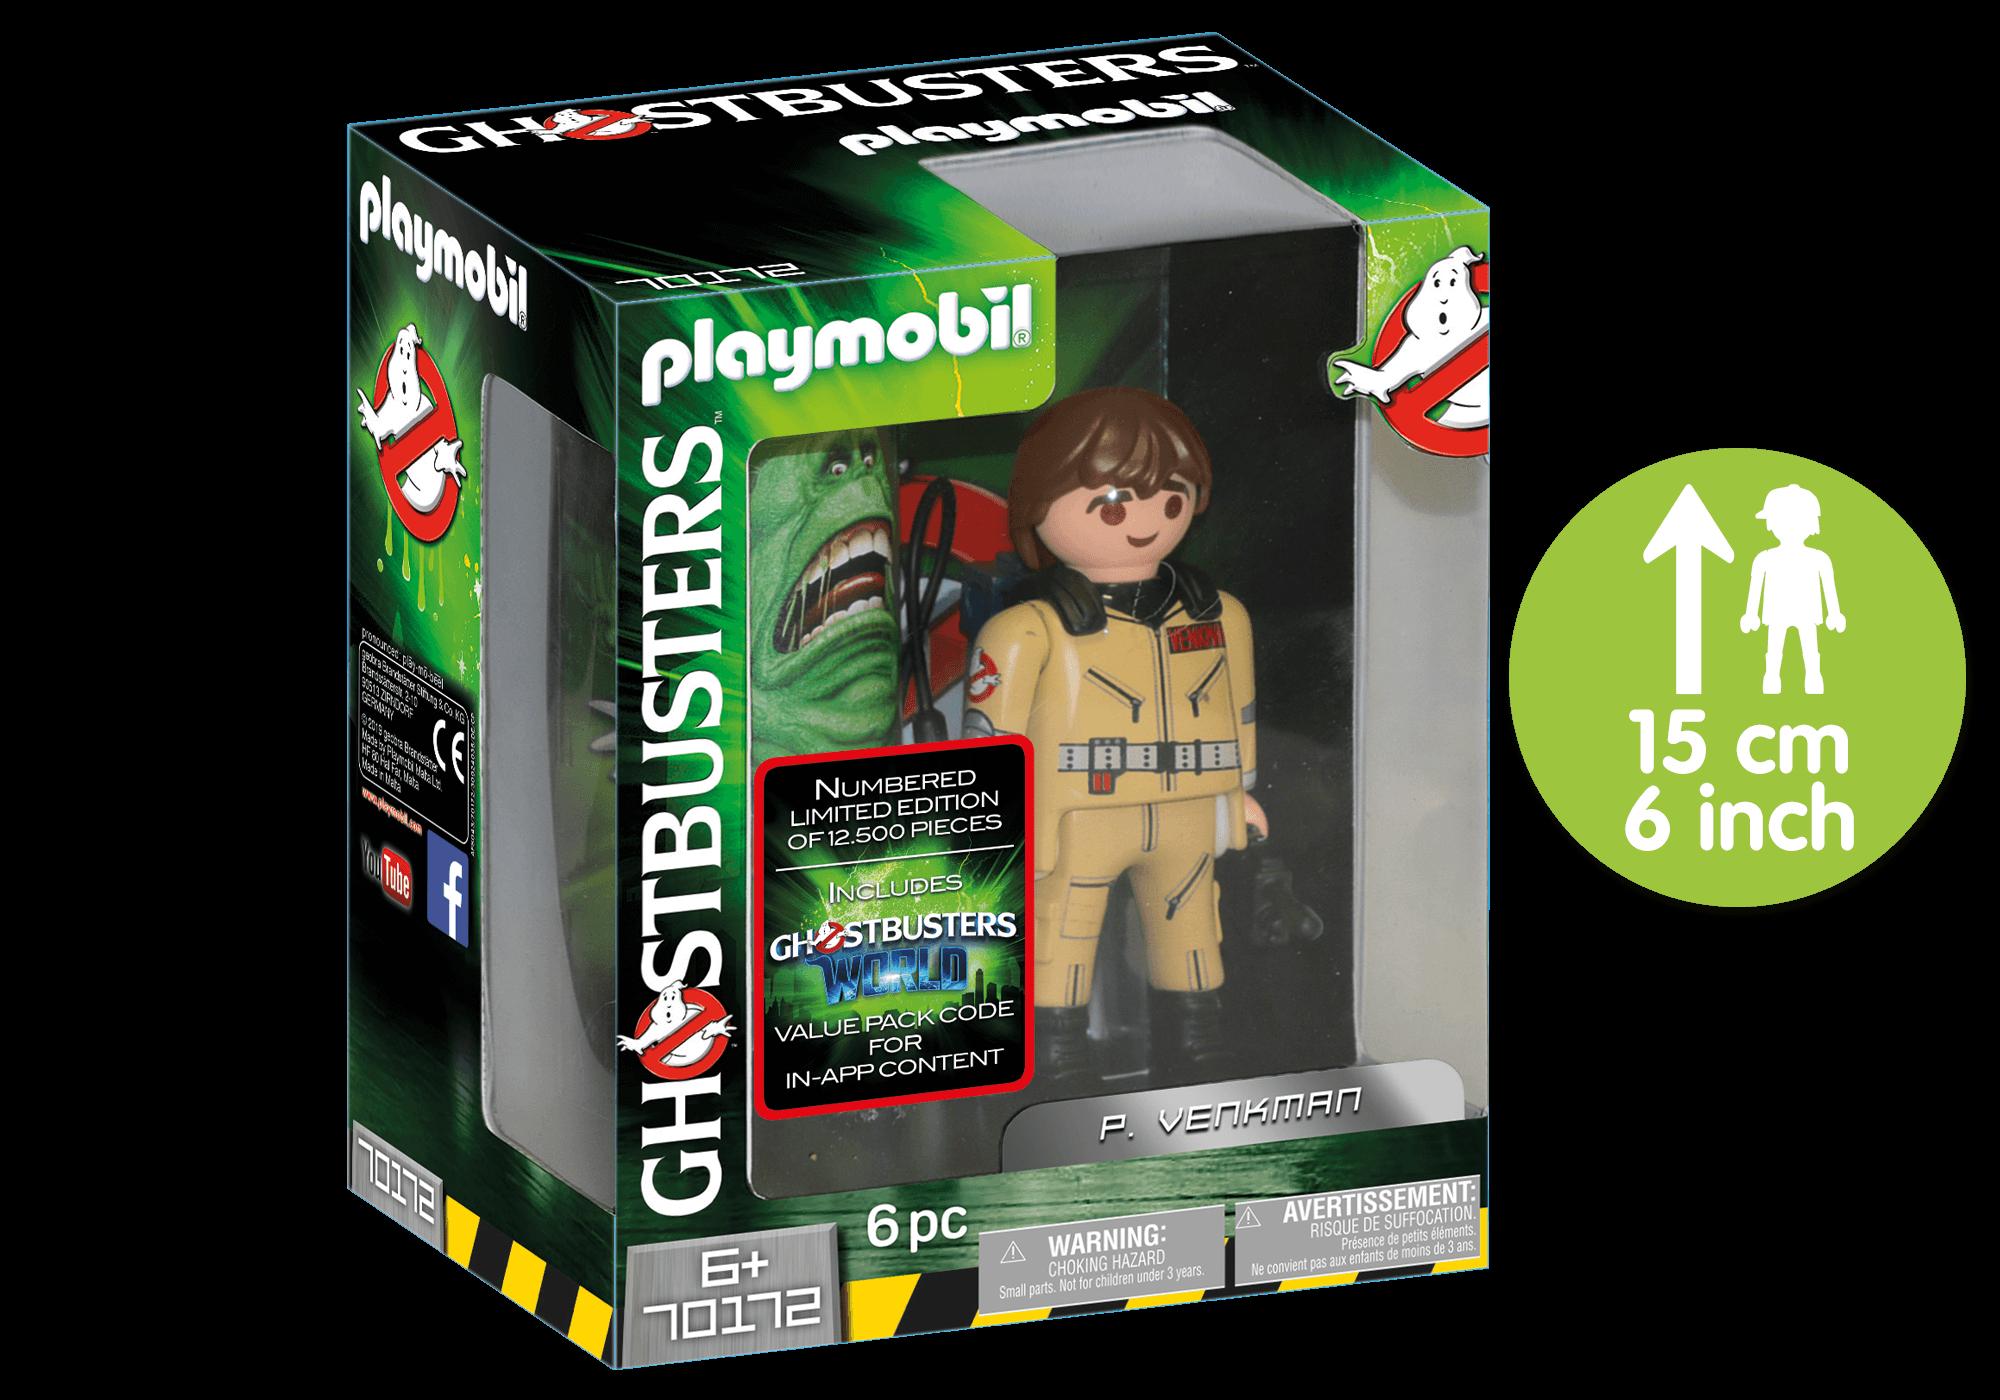 http://media.playmobil.com/i/playmobil/70172_product_detail/Ghostbusters™ Sammlerfigur P. Venkman